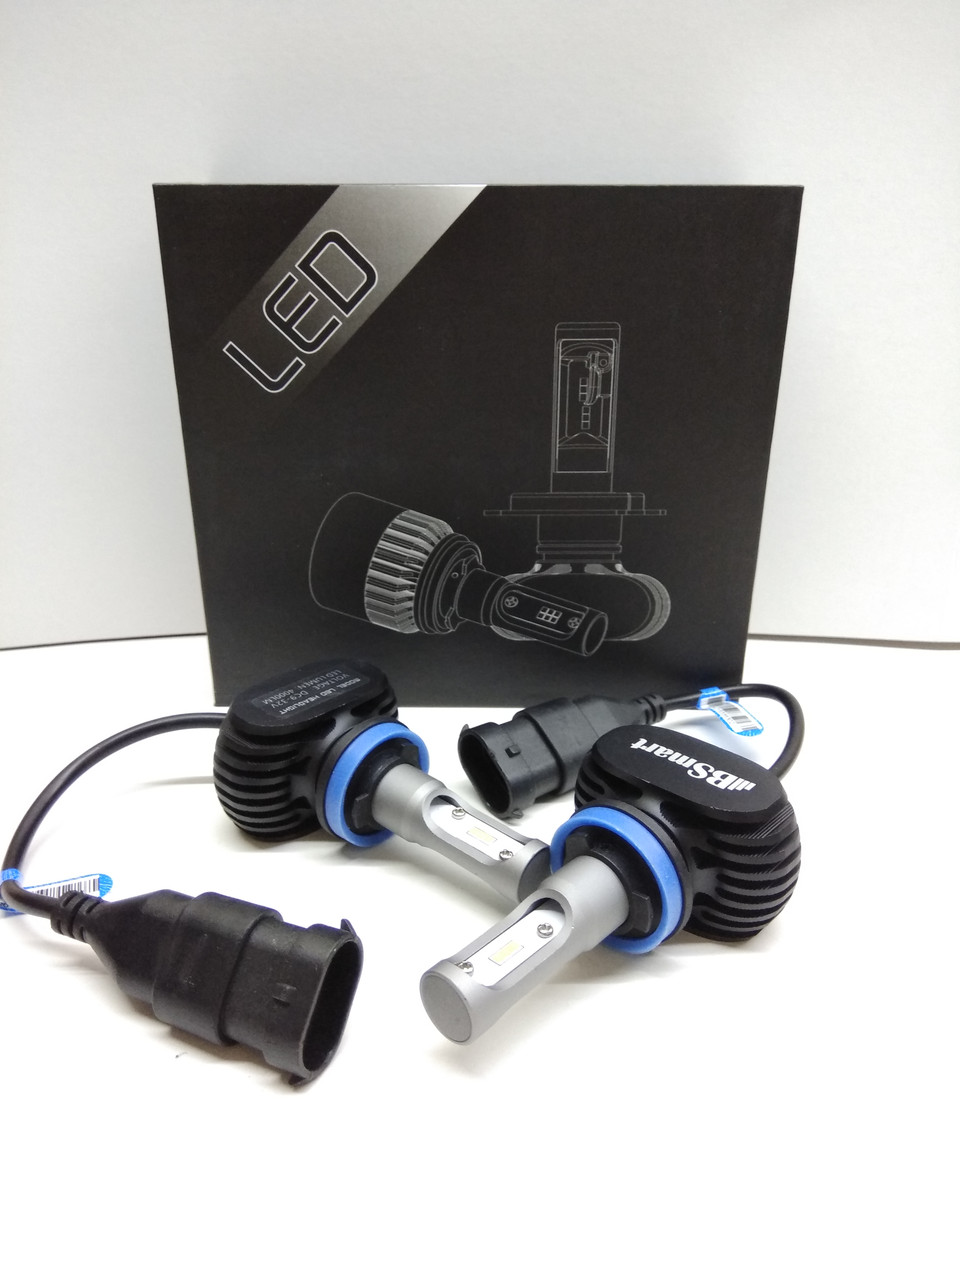 Автолампы LED S1 диод CSP Южная Корея, H9, 8000LM, 50W, 9-32V